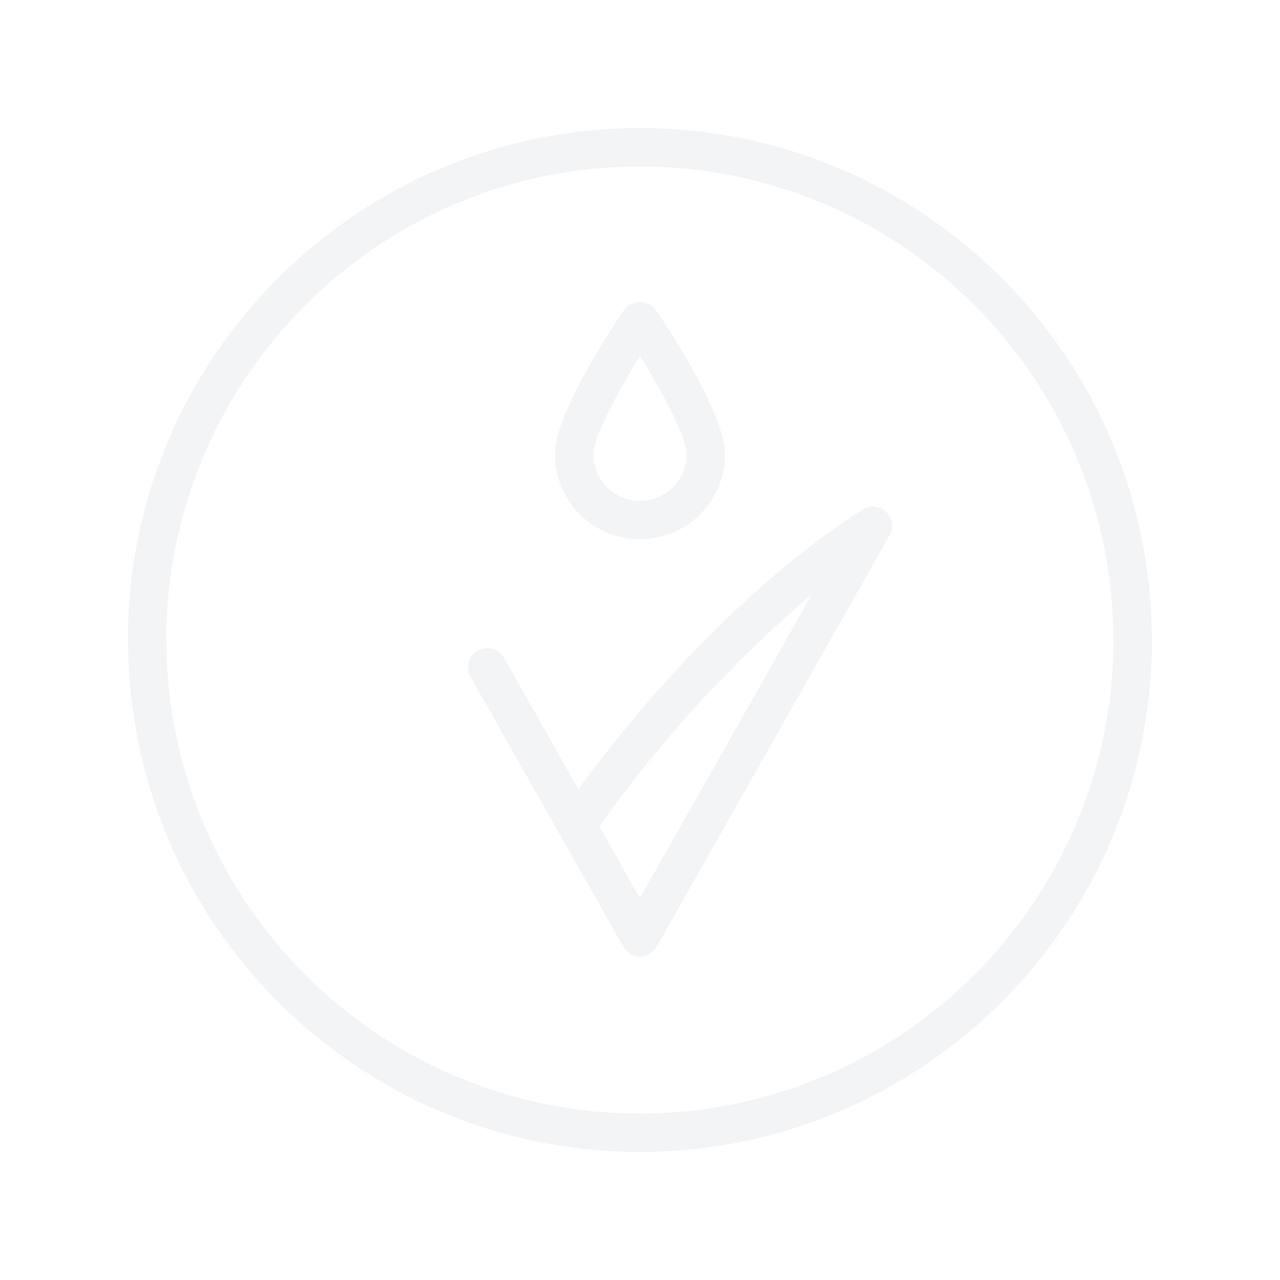 GOSH Mineral Powder 8g